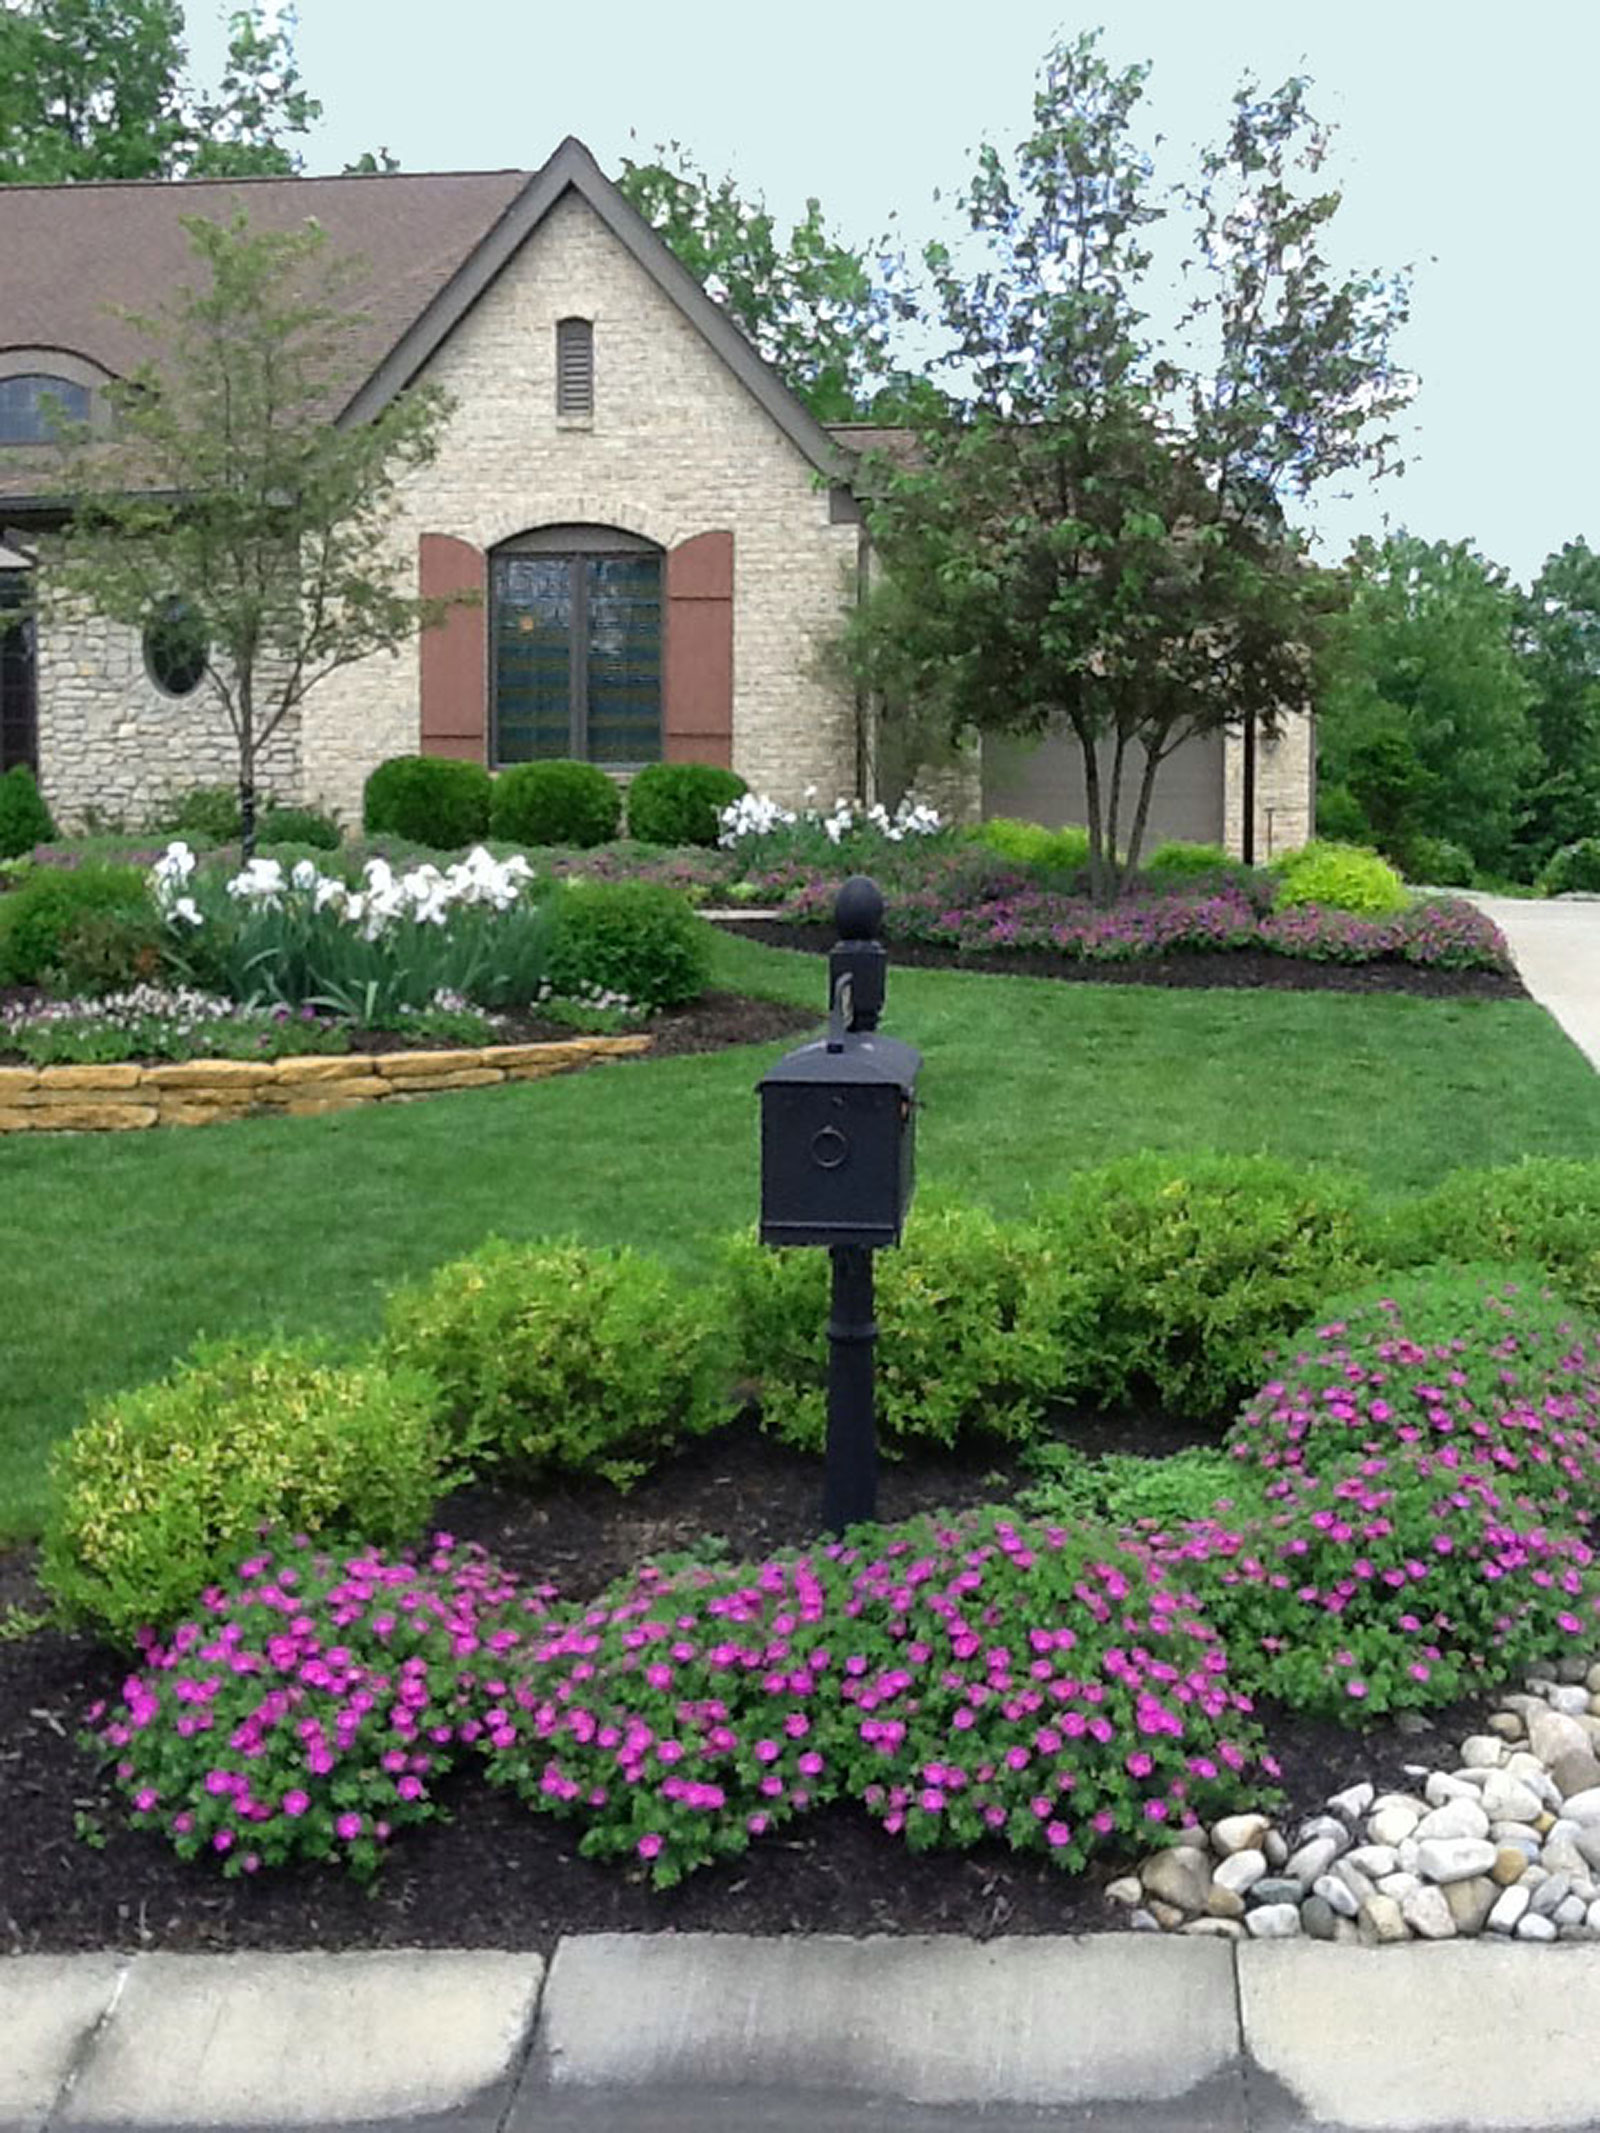 New Construction in Anderson Township  Project Spotlights  Martha Wassermann  Landscape Design